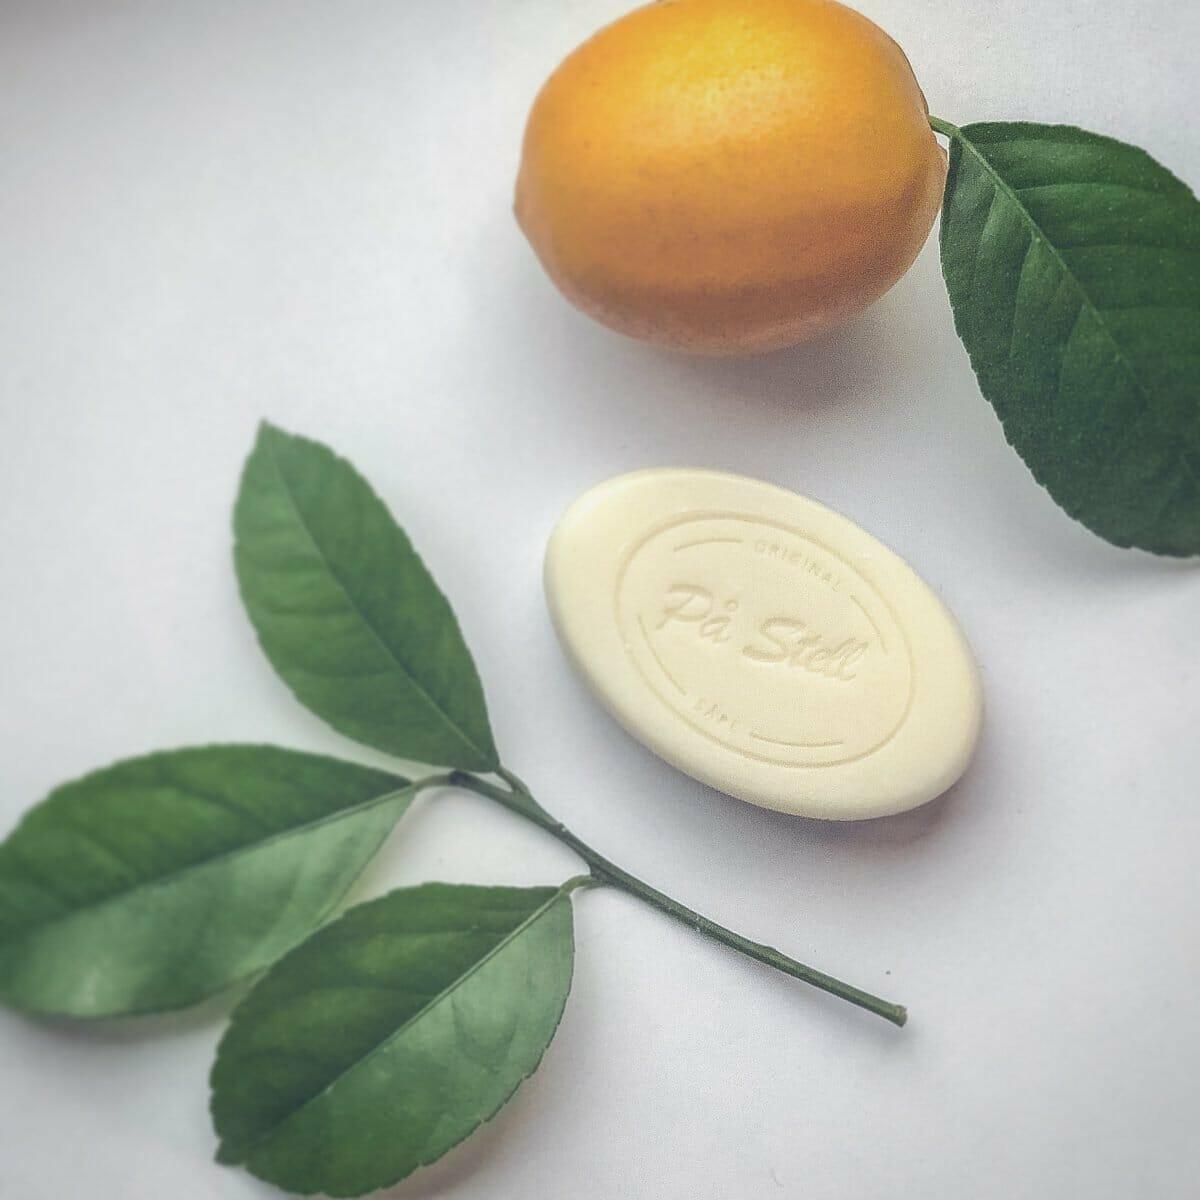 Sitronsåpe